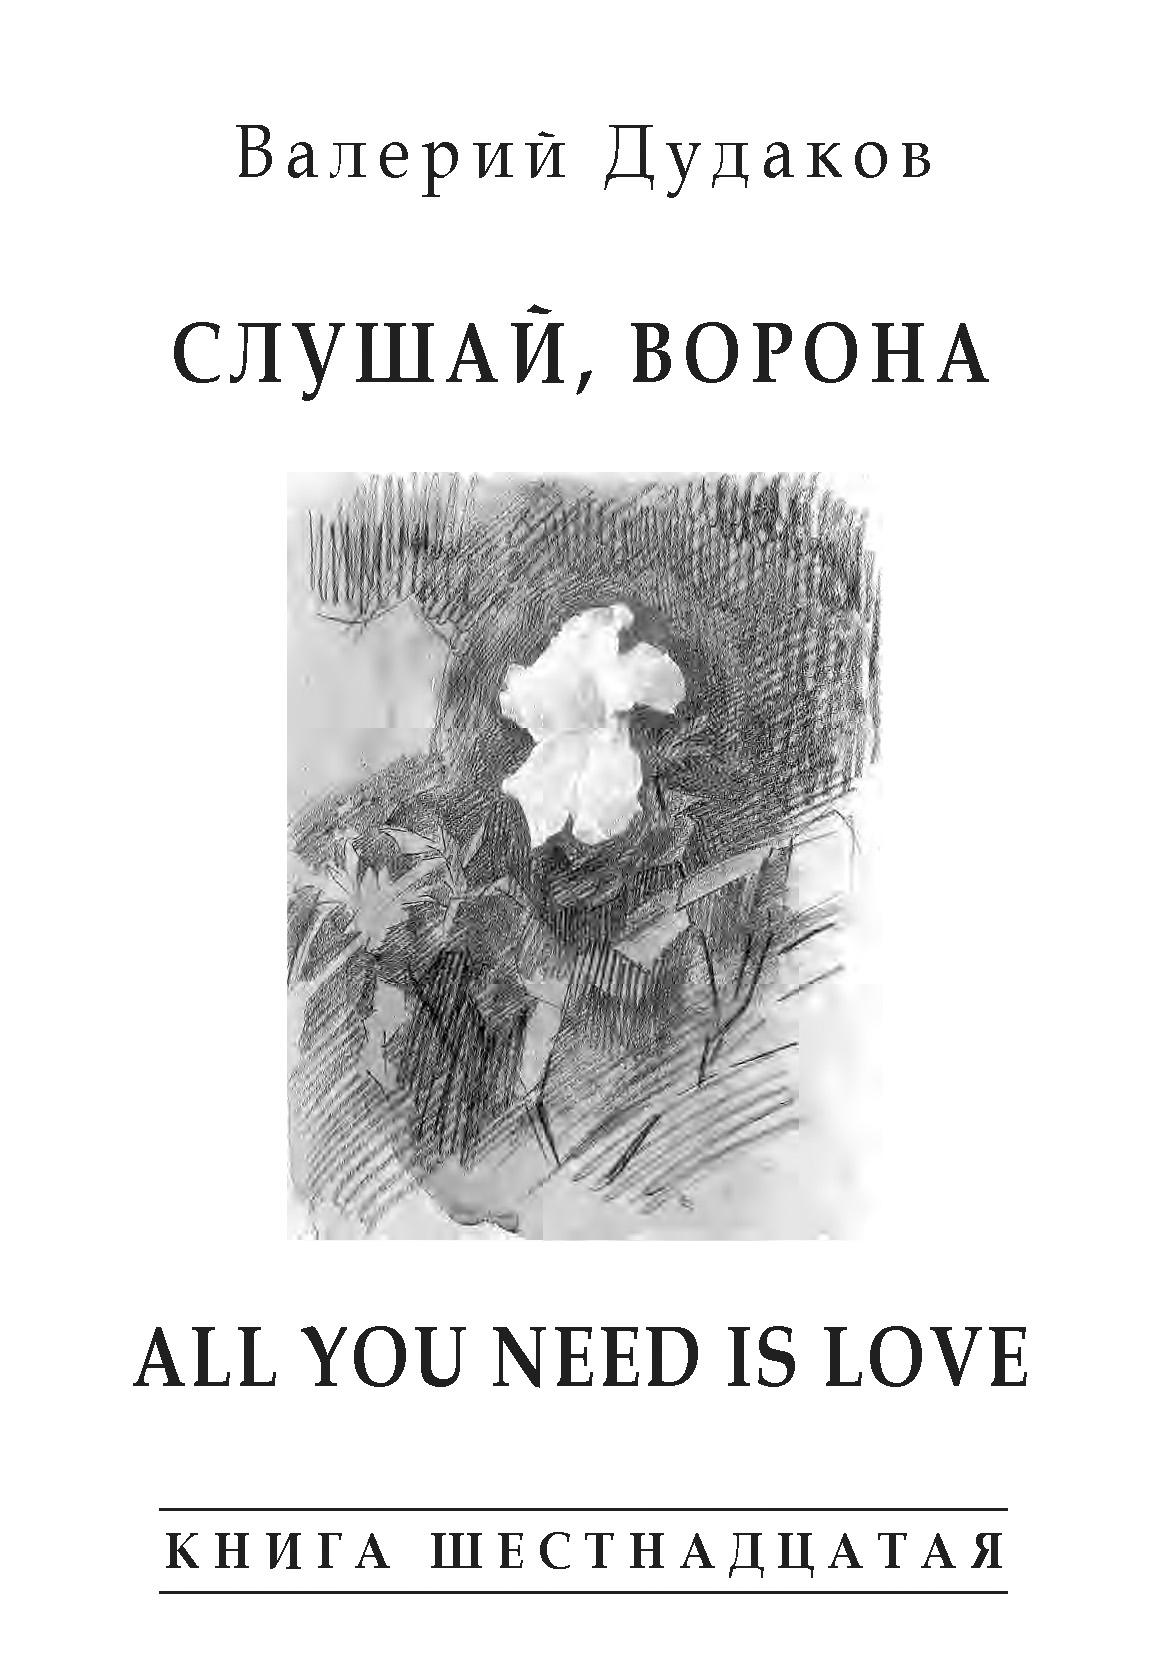 Валерий Дудаков Слушай, ворона. All Your Need Is Love валерий дудаков мои 66